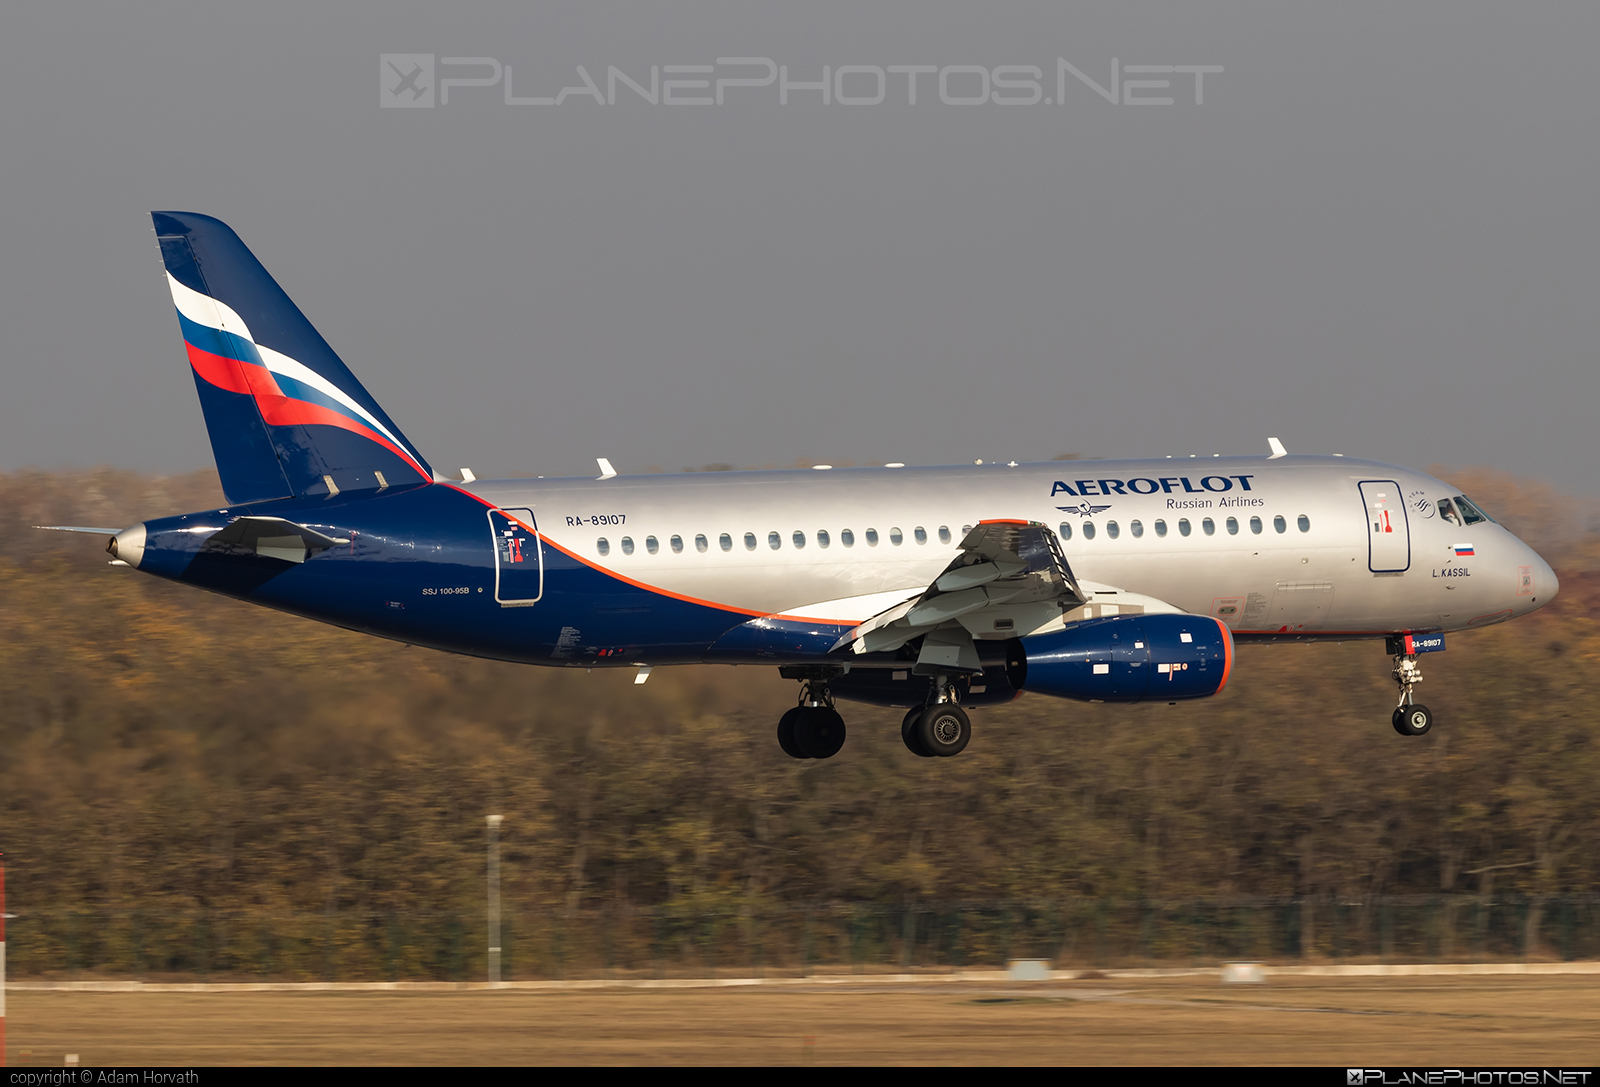 Sukhoi SSJ 100-95B Superjet - RA-89107 operated by Aeroflot #aeroflot #ssj100 #ssj10095b #sukhoi #sukhoisuperjet #superjet